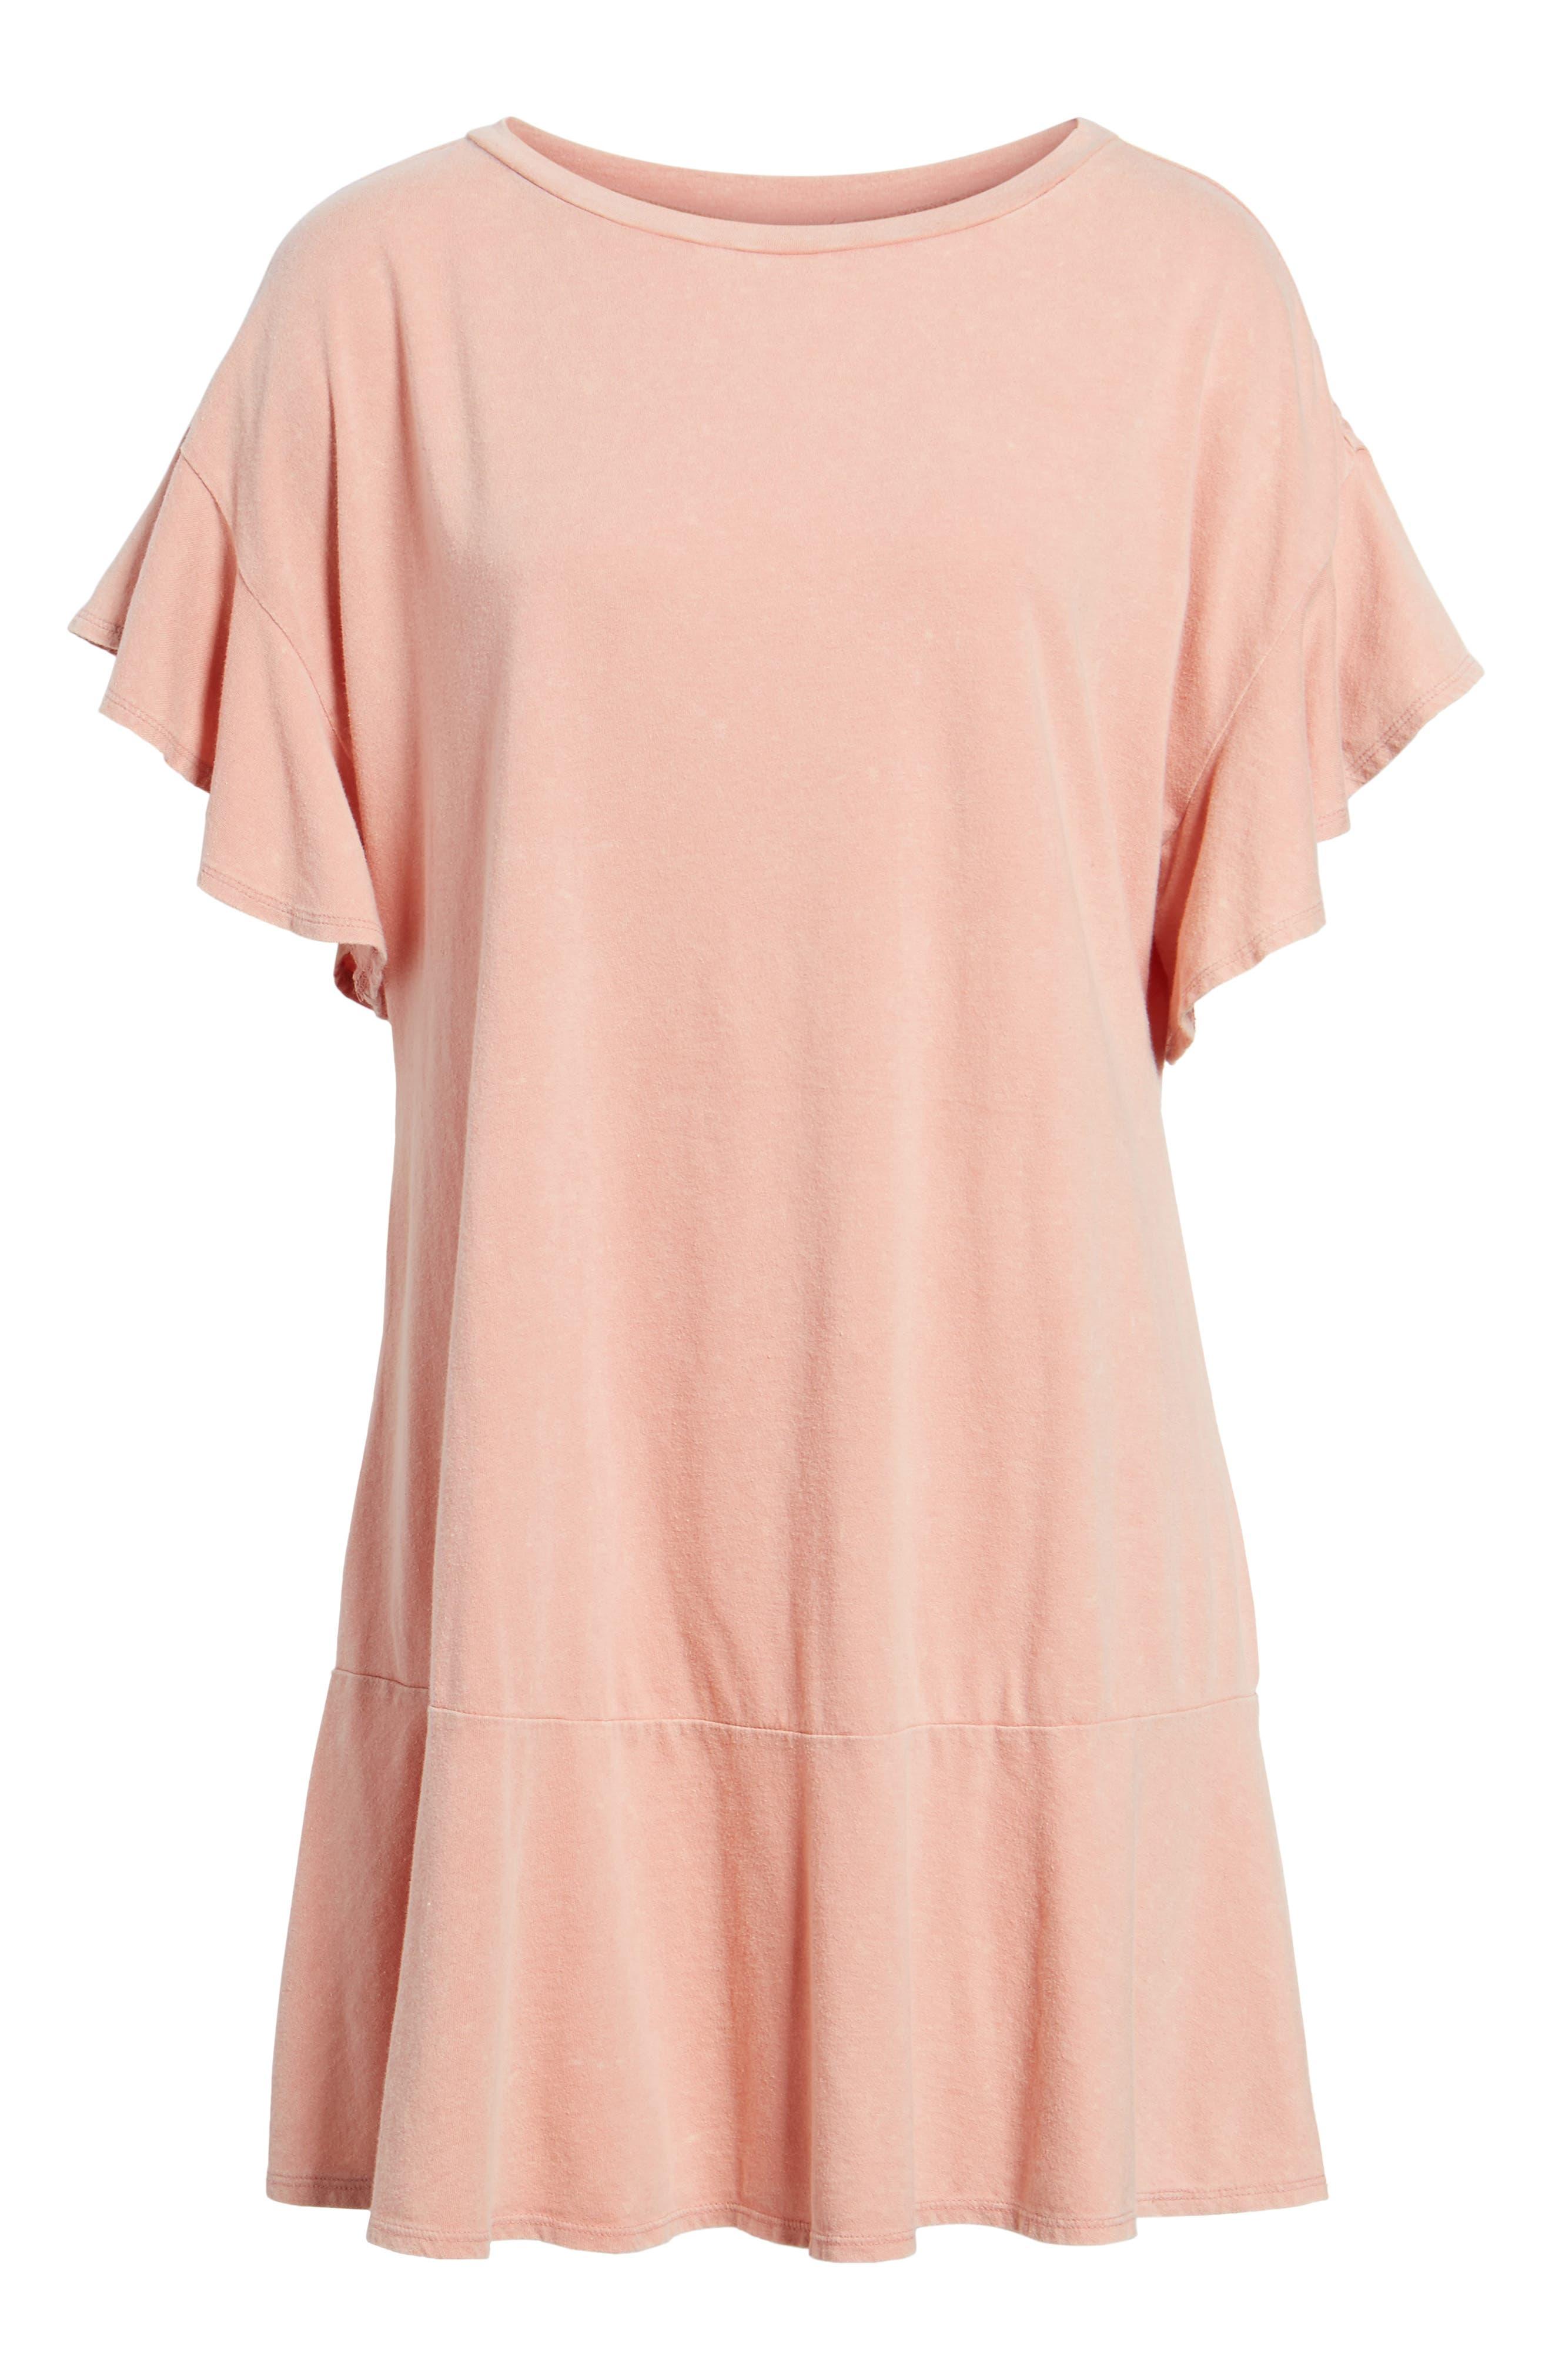 Stonewash Ruffle Trim Dress,                             Alternate thumbnail 6, color,                             Pink Dawn